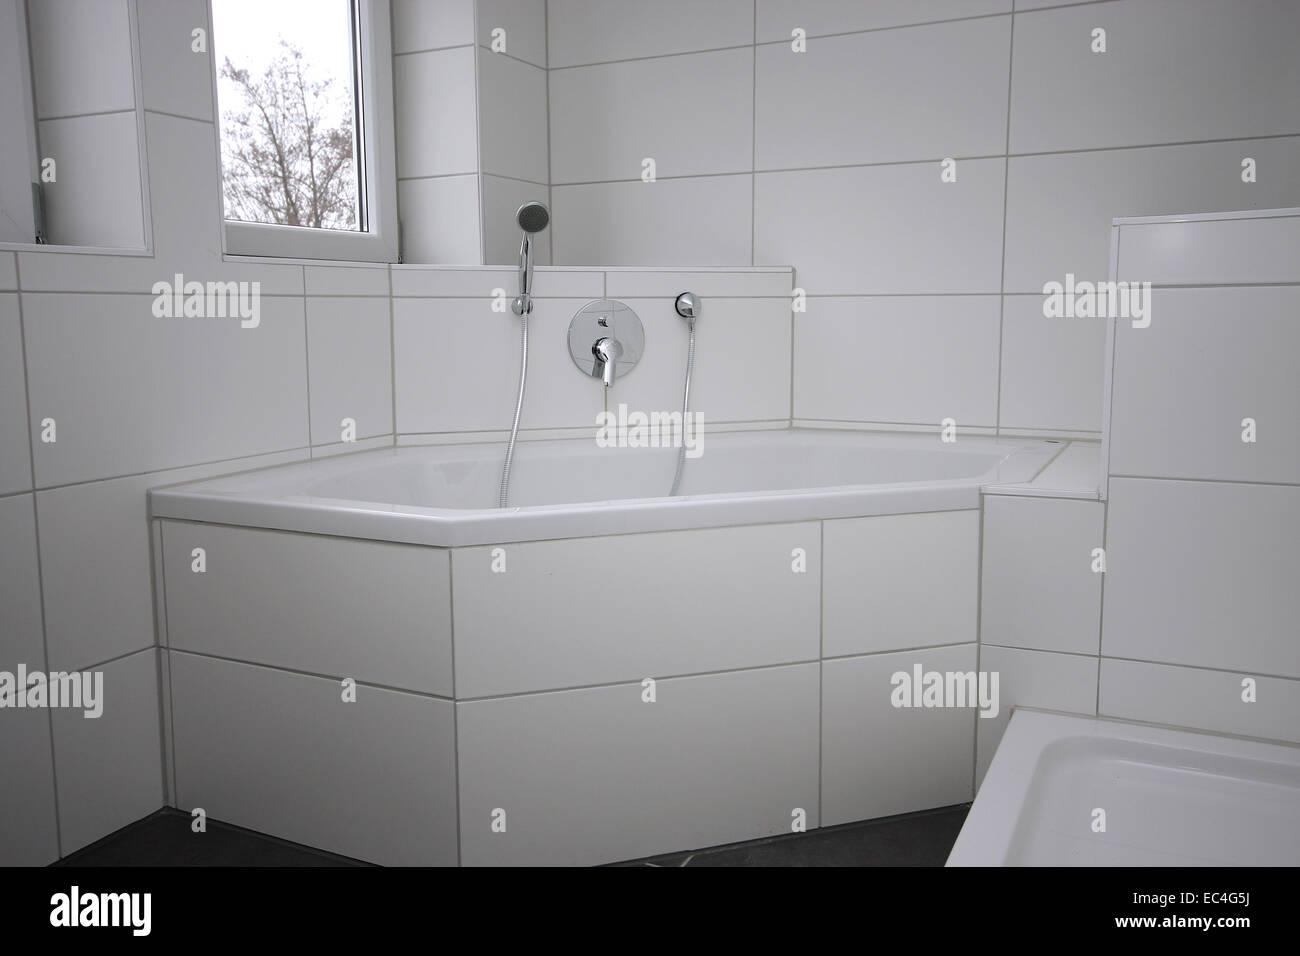 Vasca Da Bagno Angolo : Vasca da bagno ad angolo hallencyclopedia